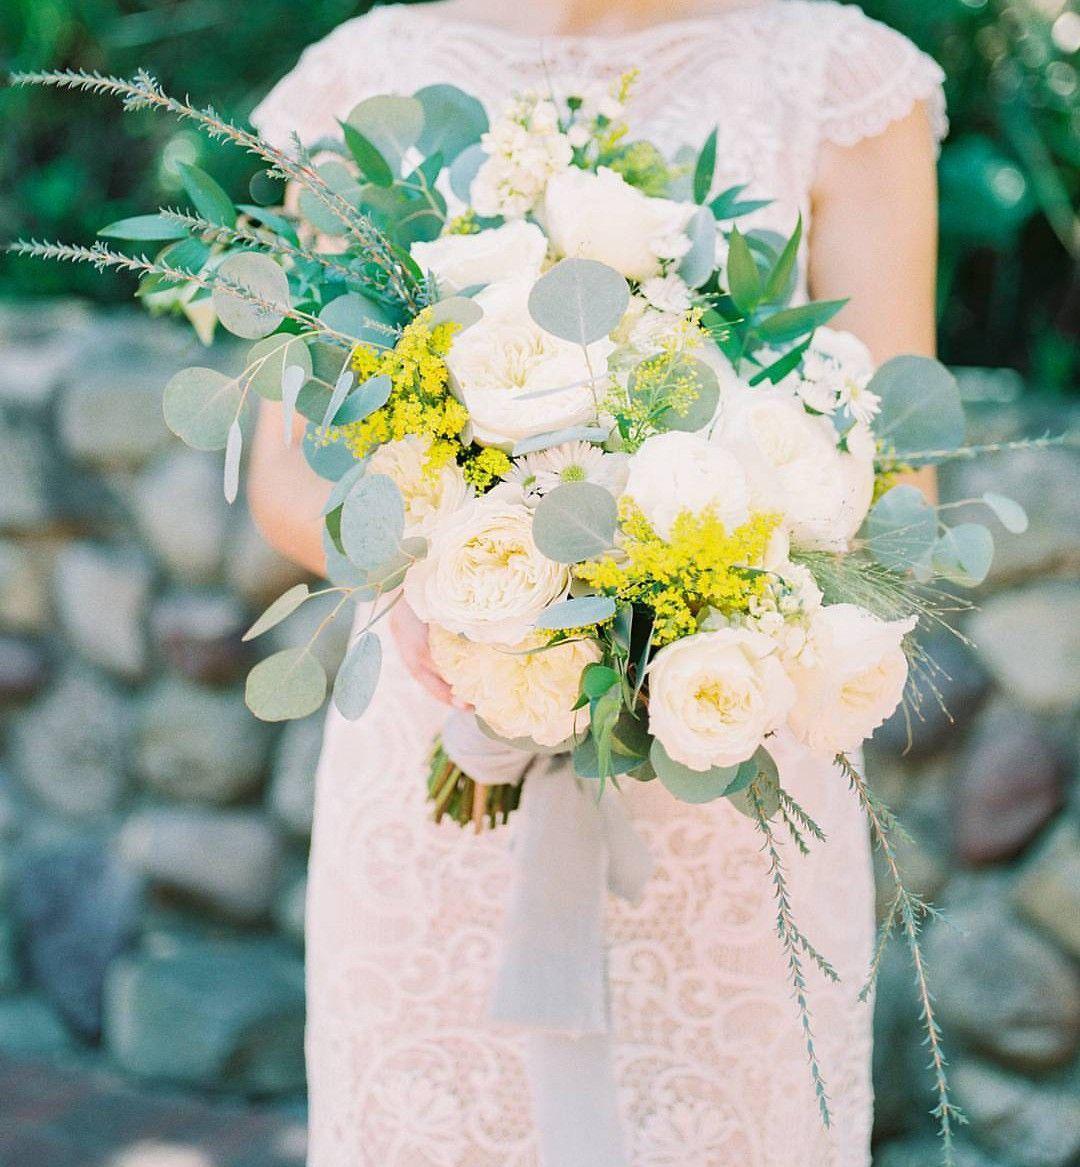 Pin by Nicole Fults on My Summer Wedding Ideas Pinterest Wedding